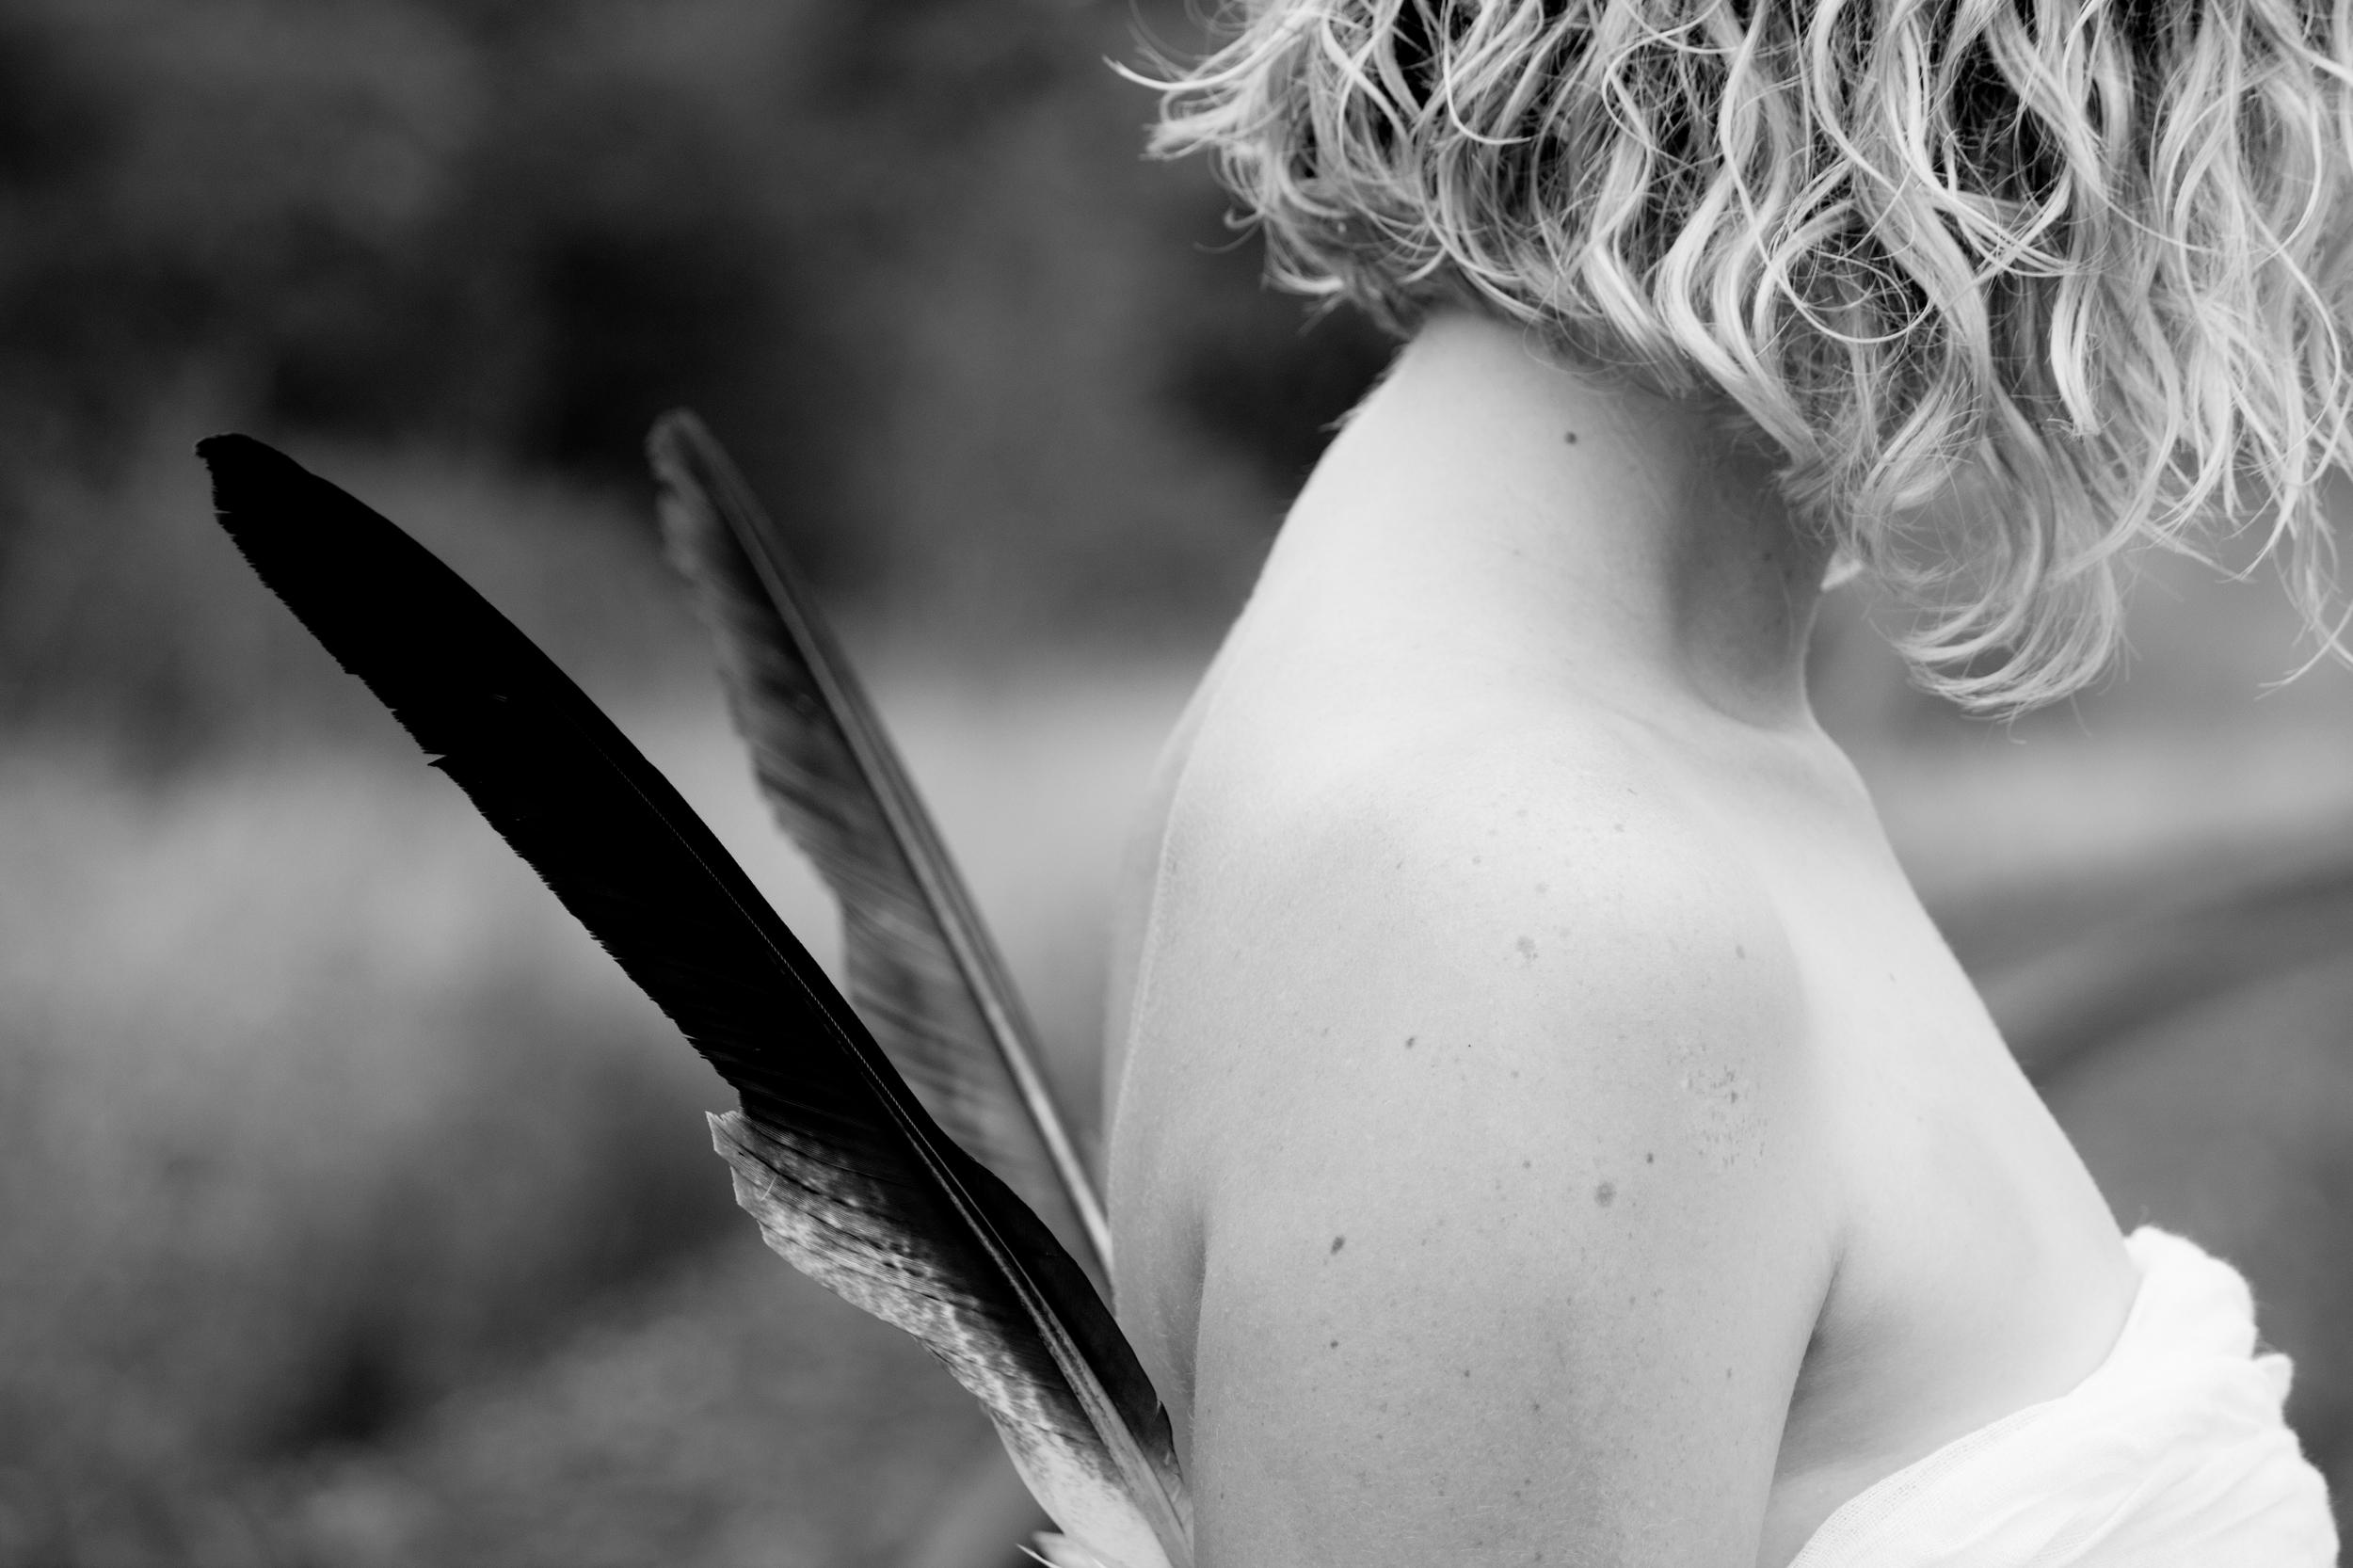 charmaine lyons. 2014 - SCAR STORIES_-9.jpg